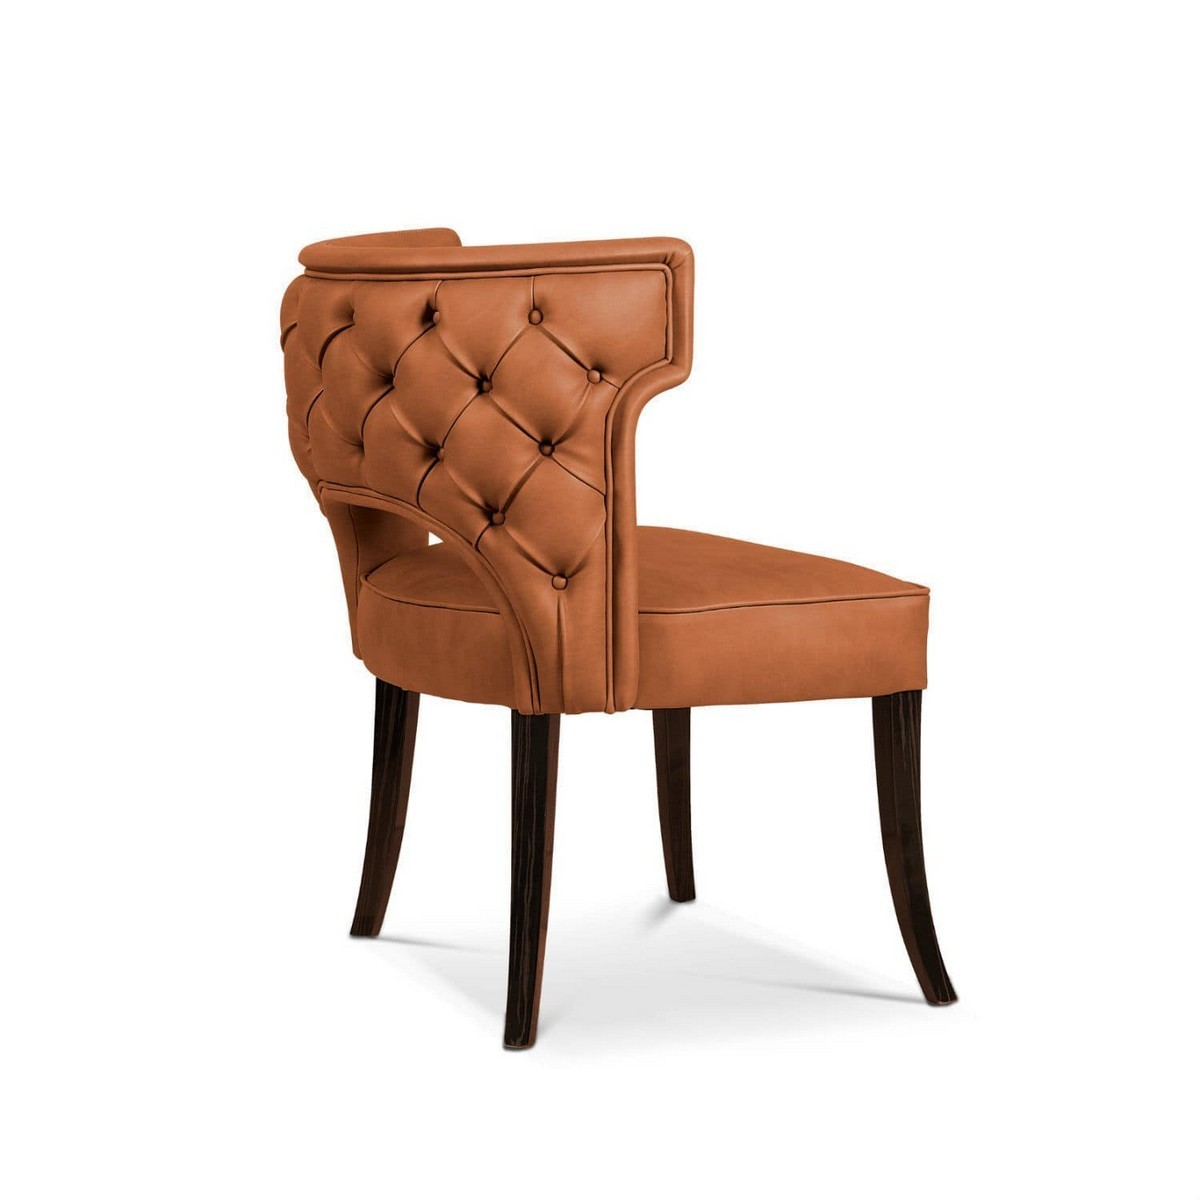 Top Minimalist Dining Chairs minimalist dining chairs Top Minimalist Dining Chairs kansas2